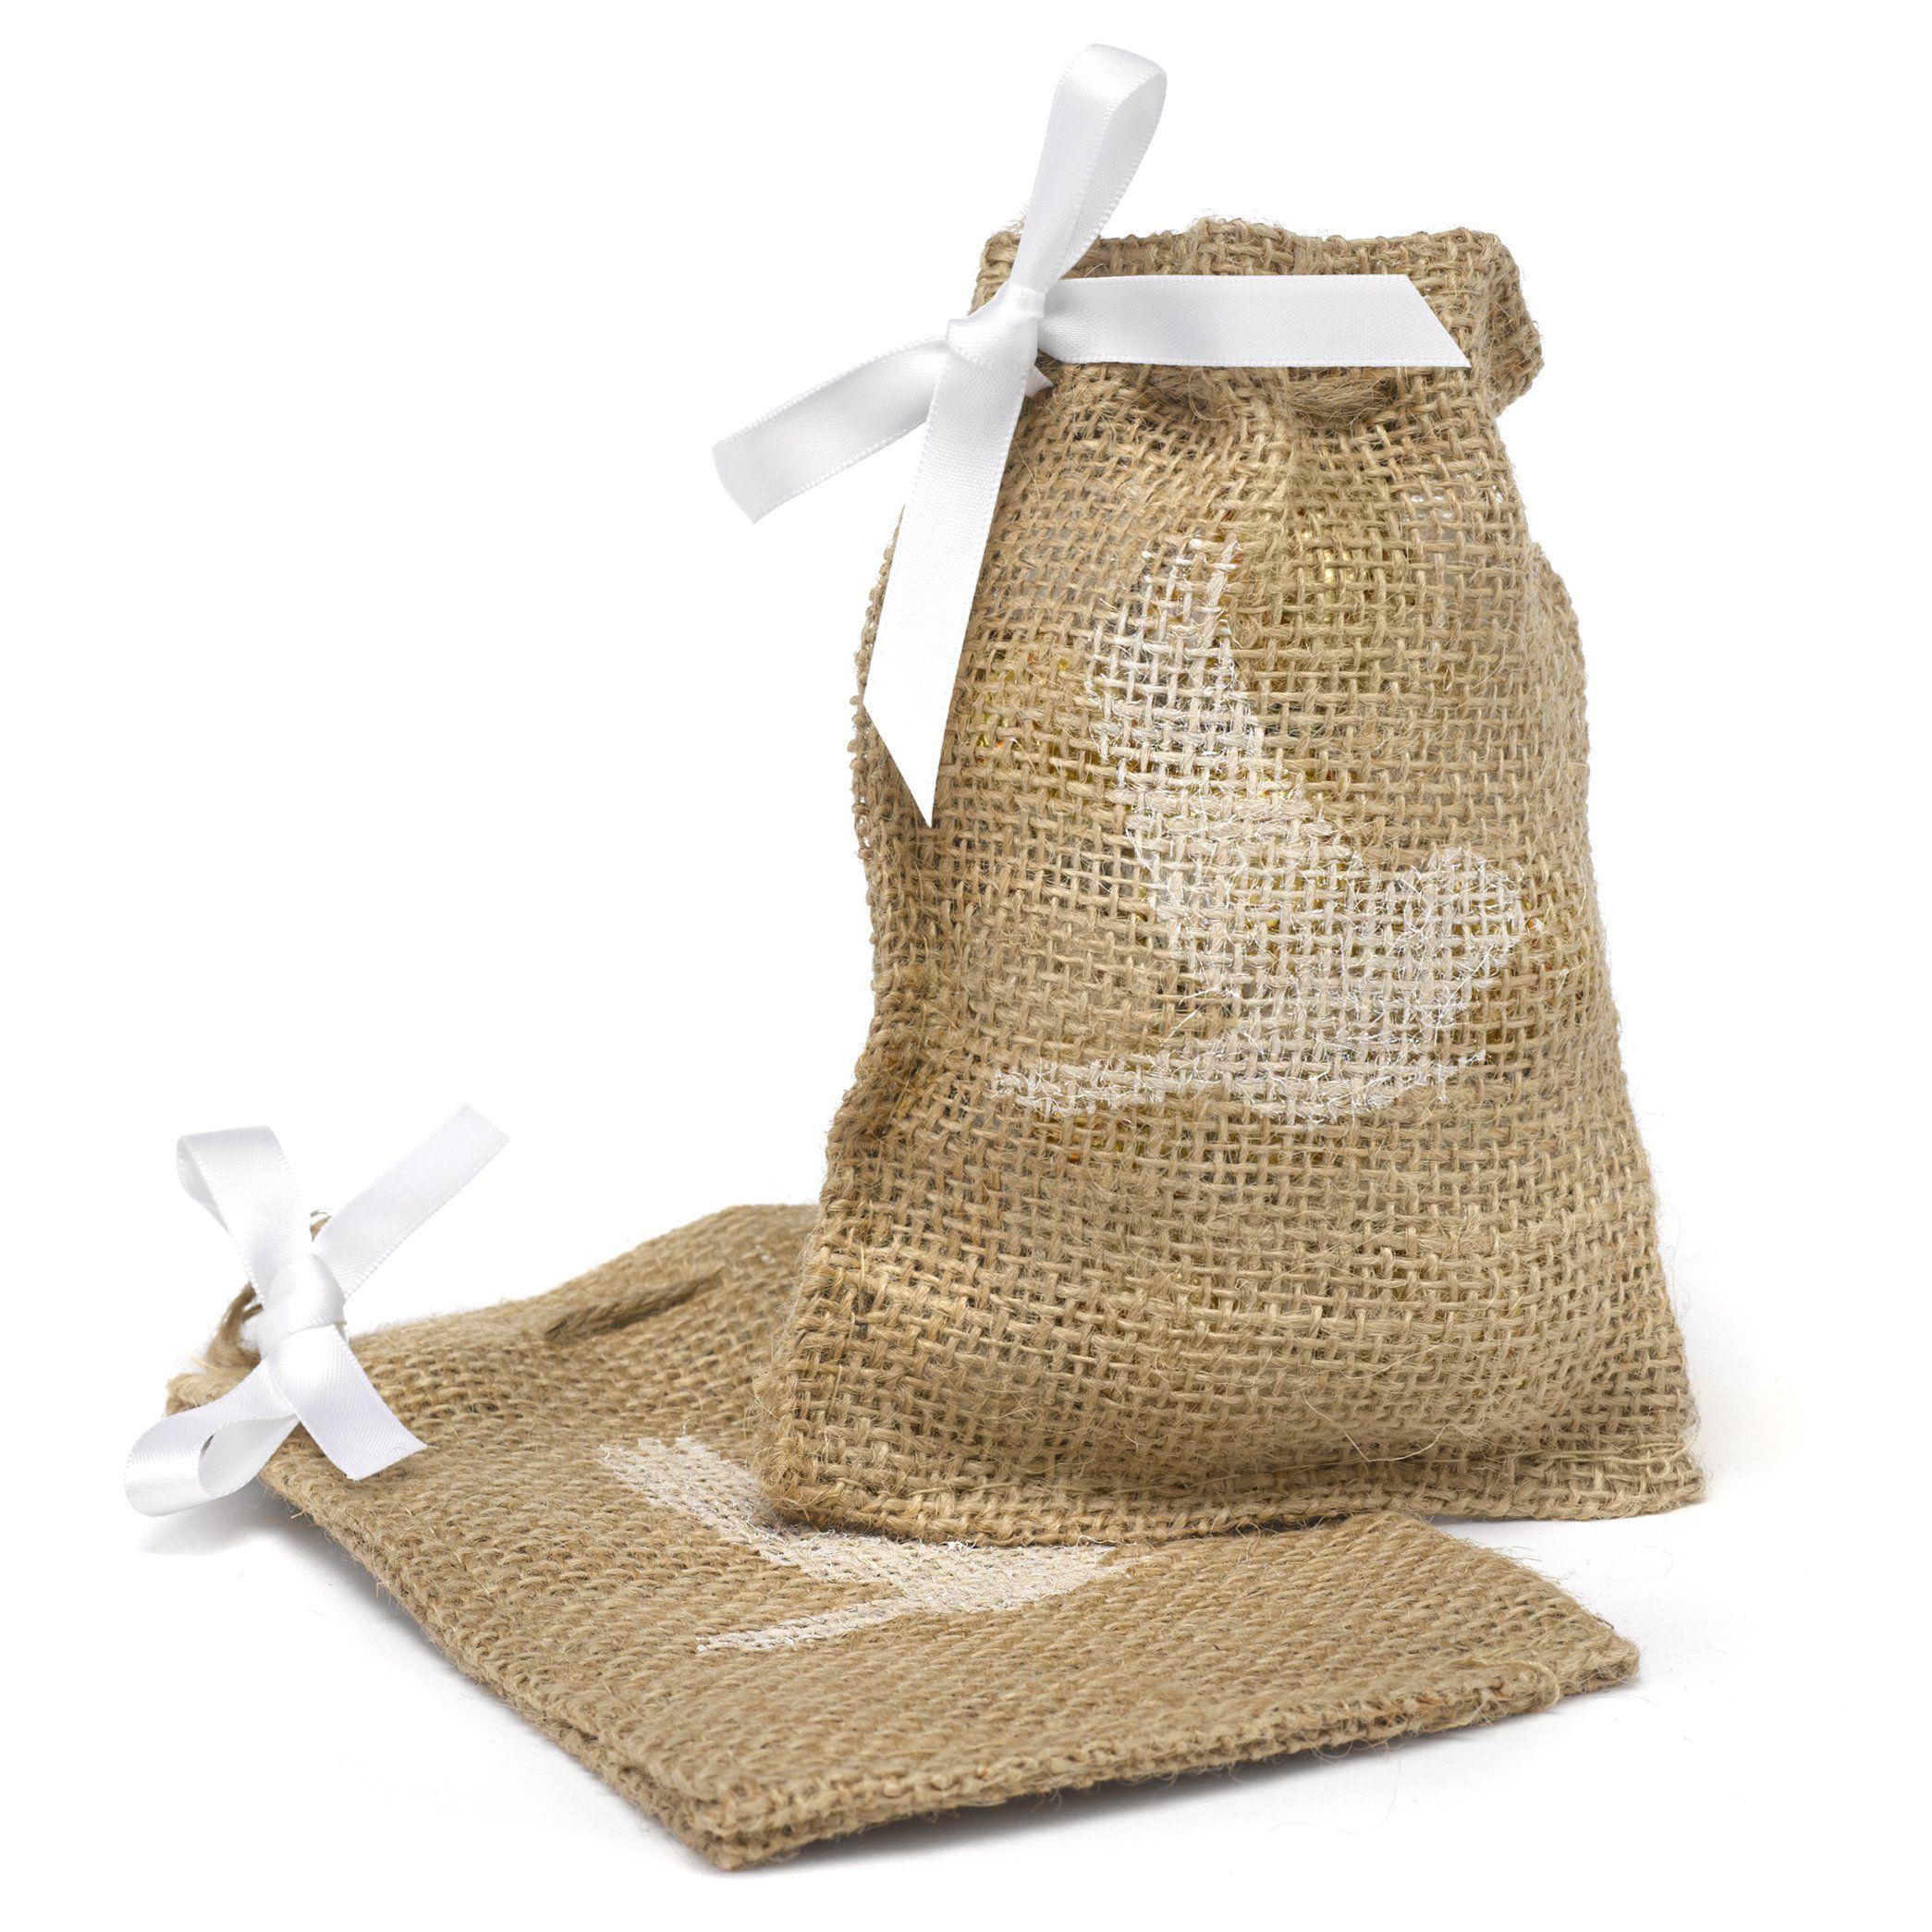 Amazon.com - Hortense B. Hewitt Burlap Favor Bags Wedding ...